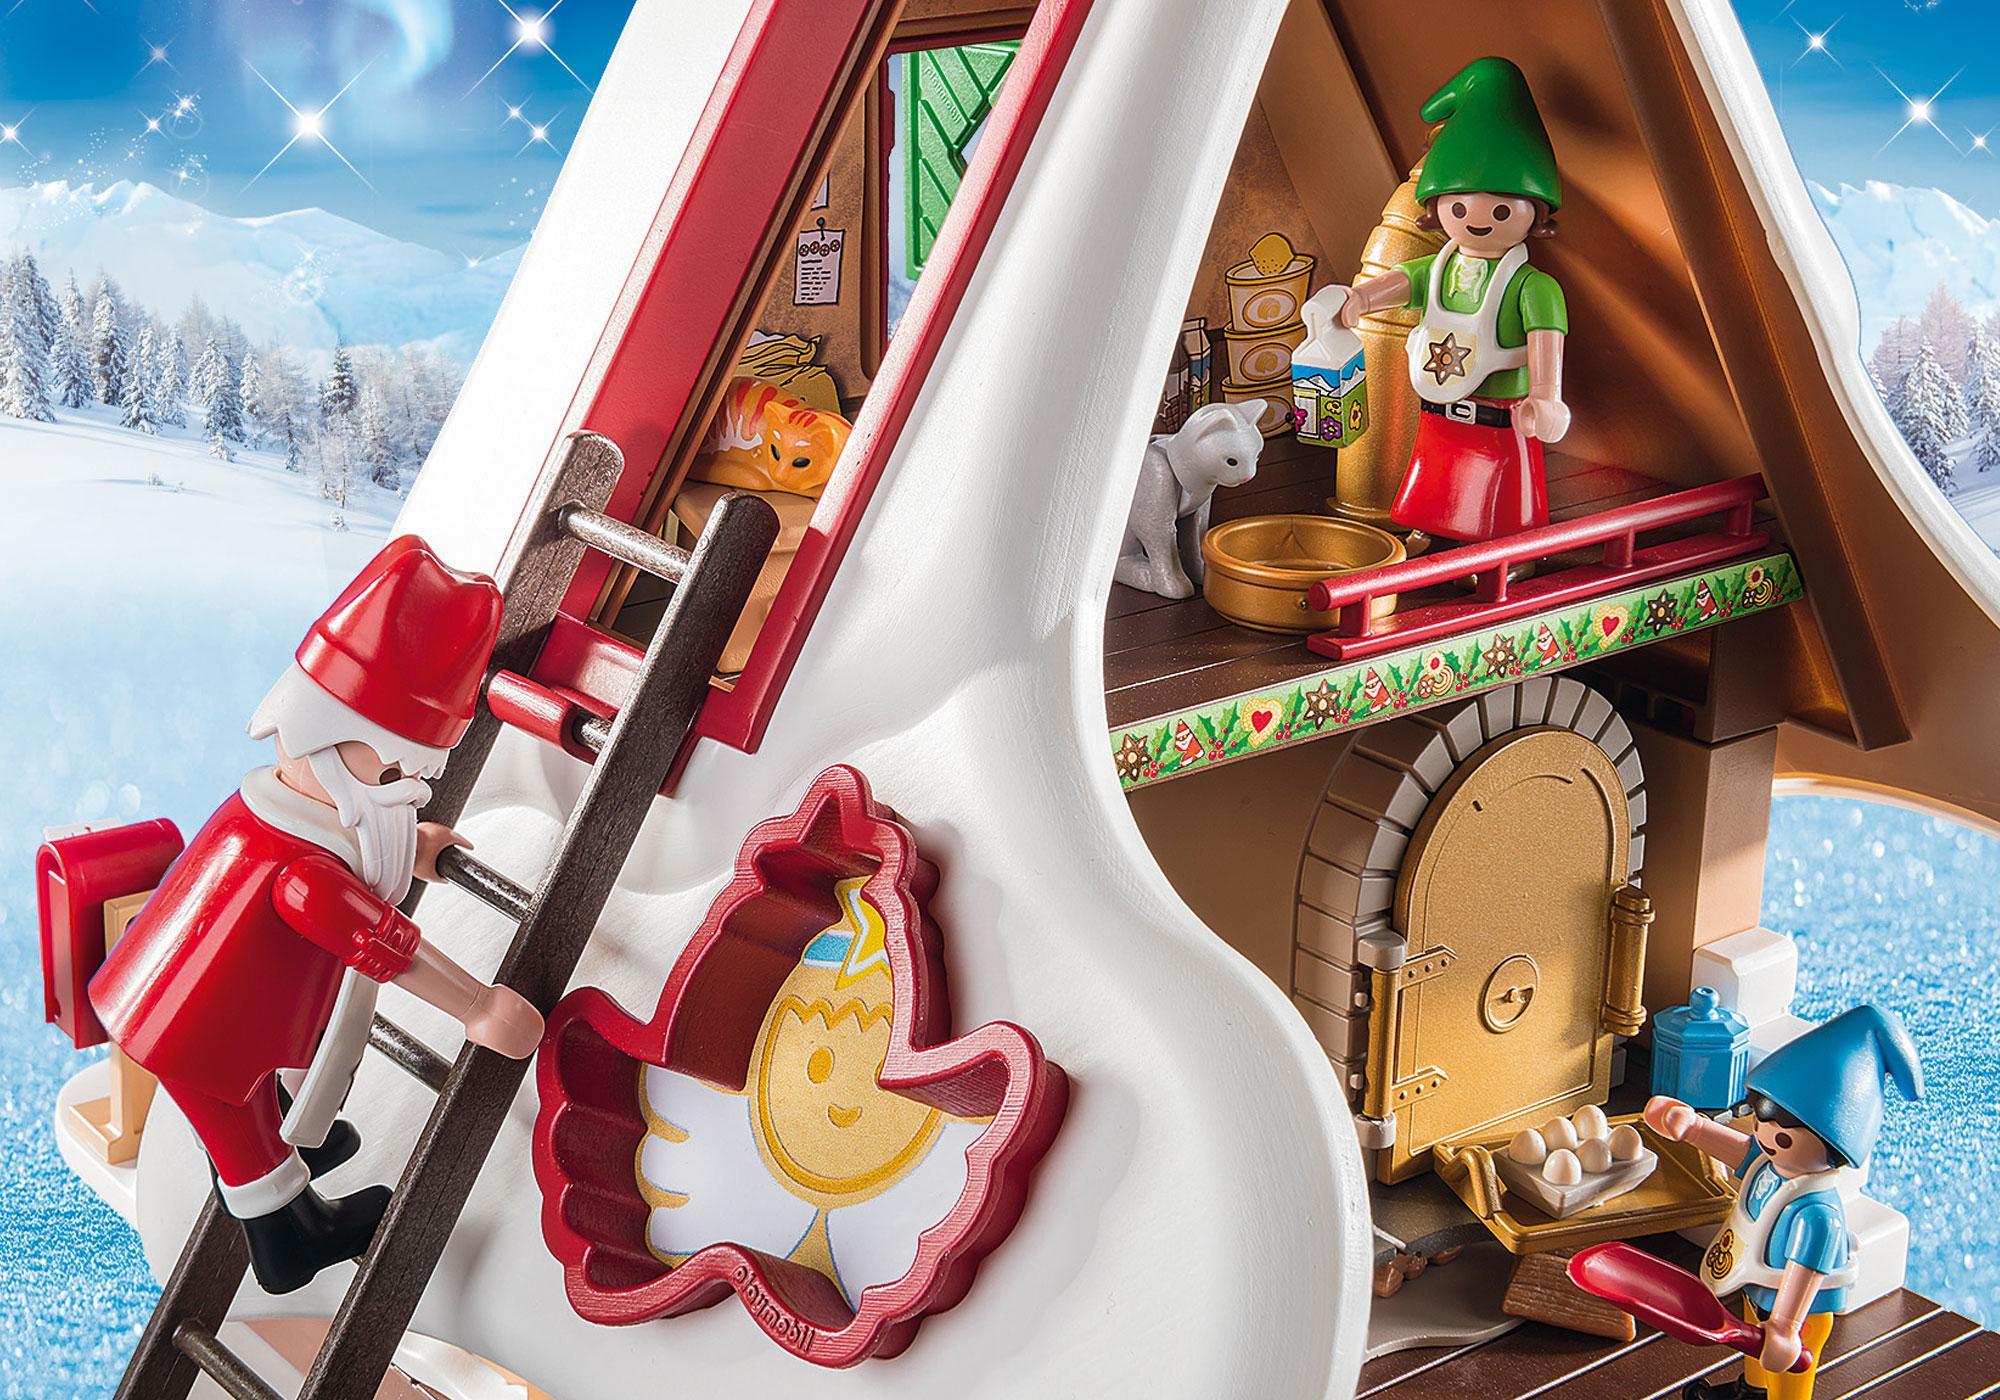 http://media.playmobil.com/i/playmobil/9493_product_extra2/Julebageri med småkageskærere